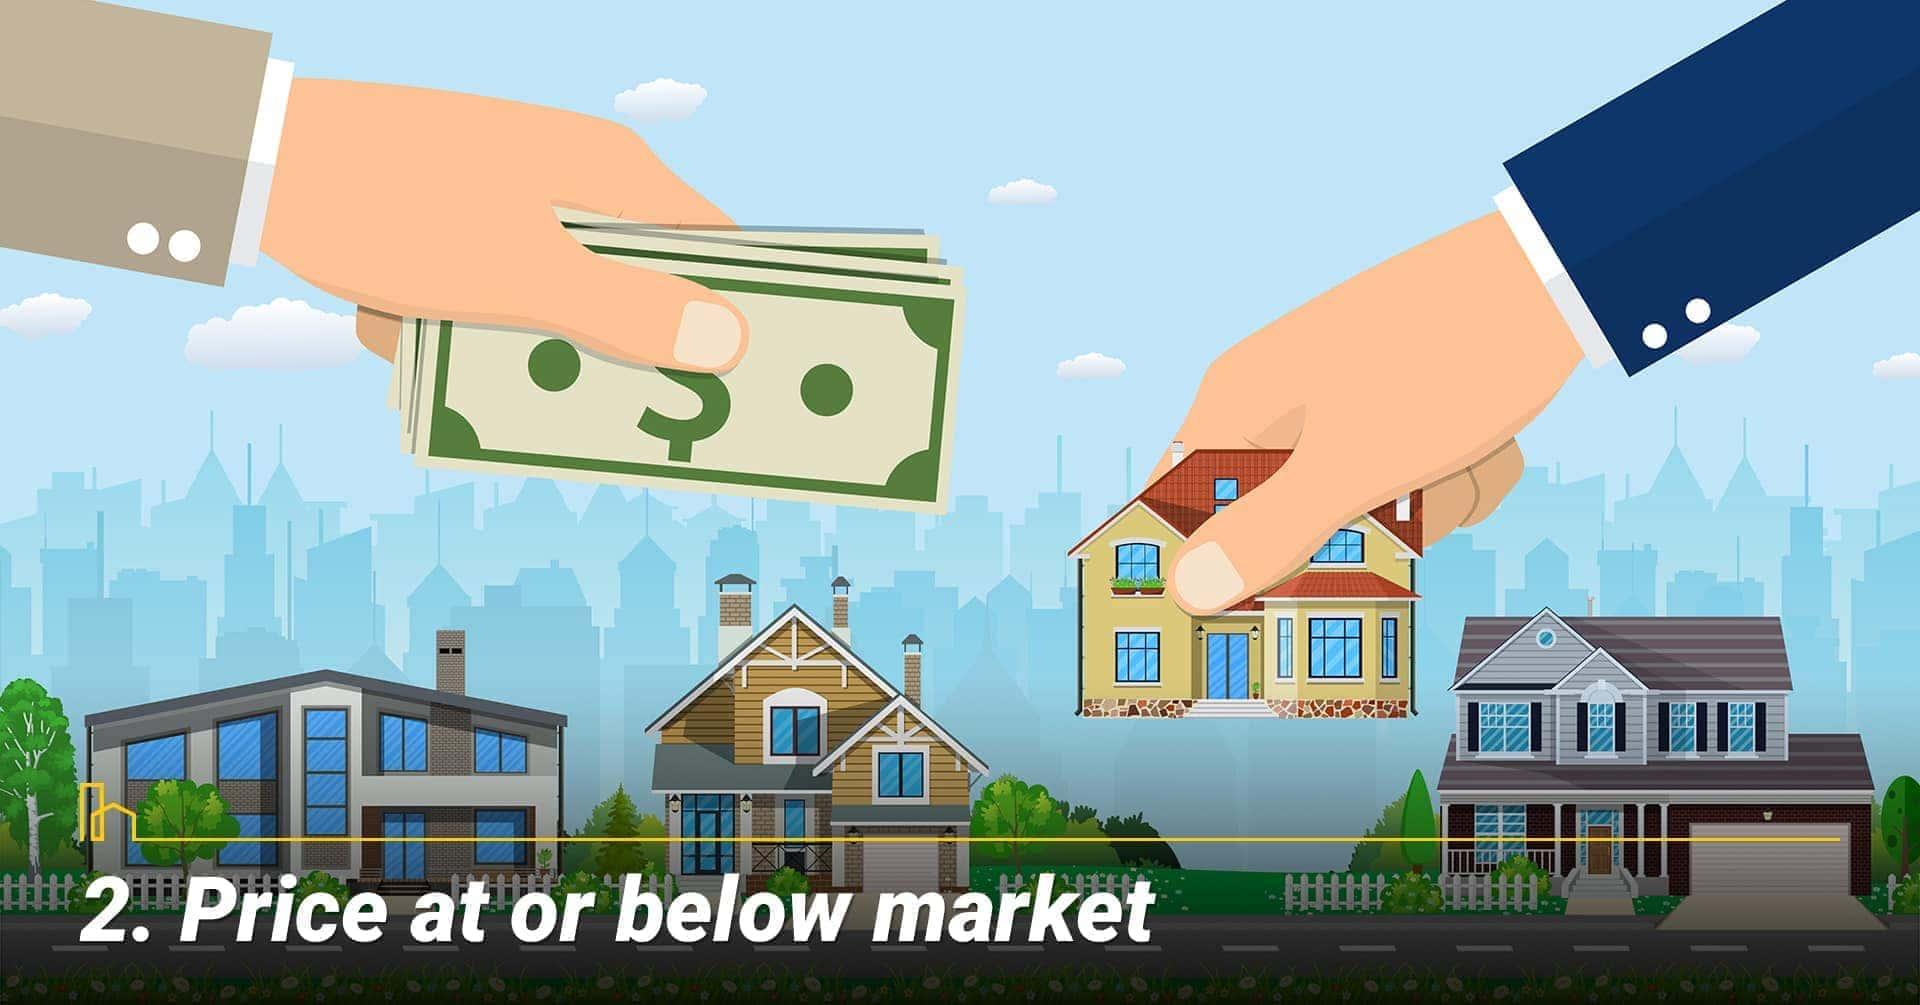 Price at or below market